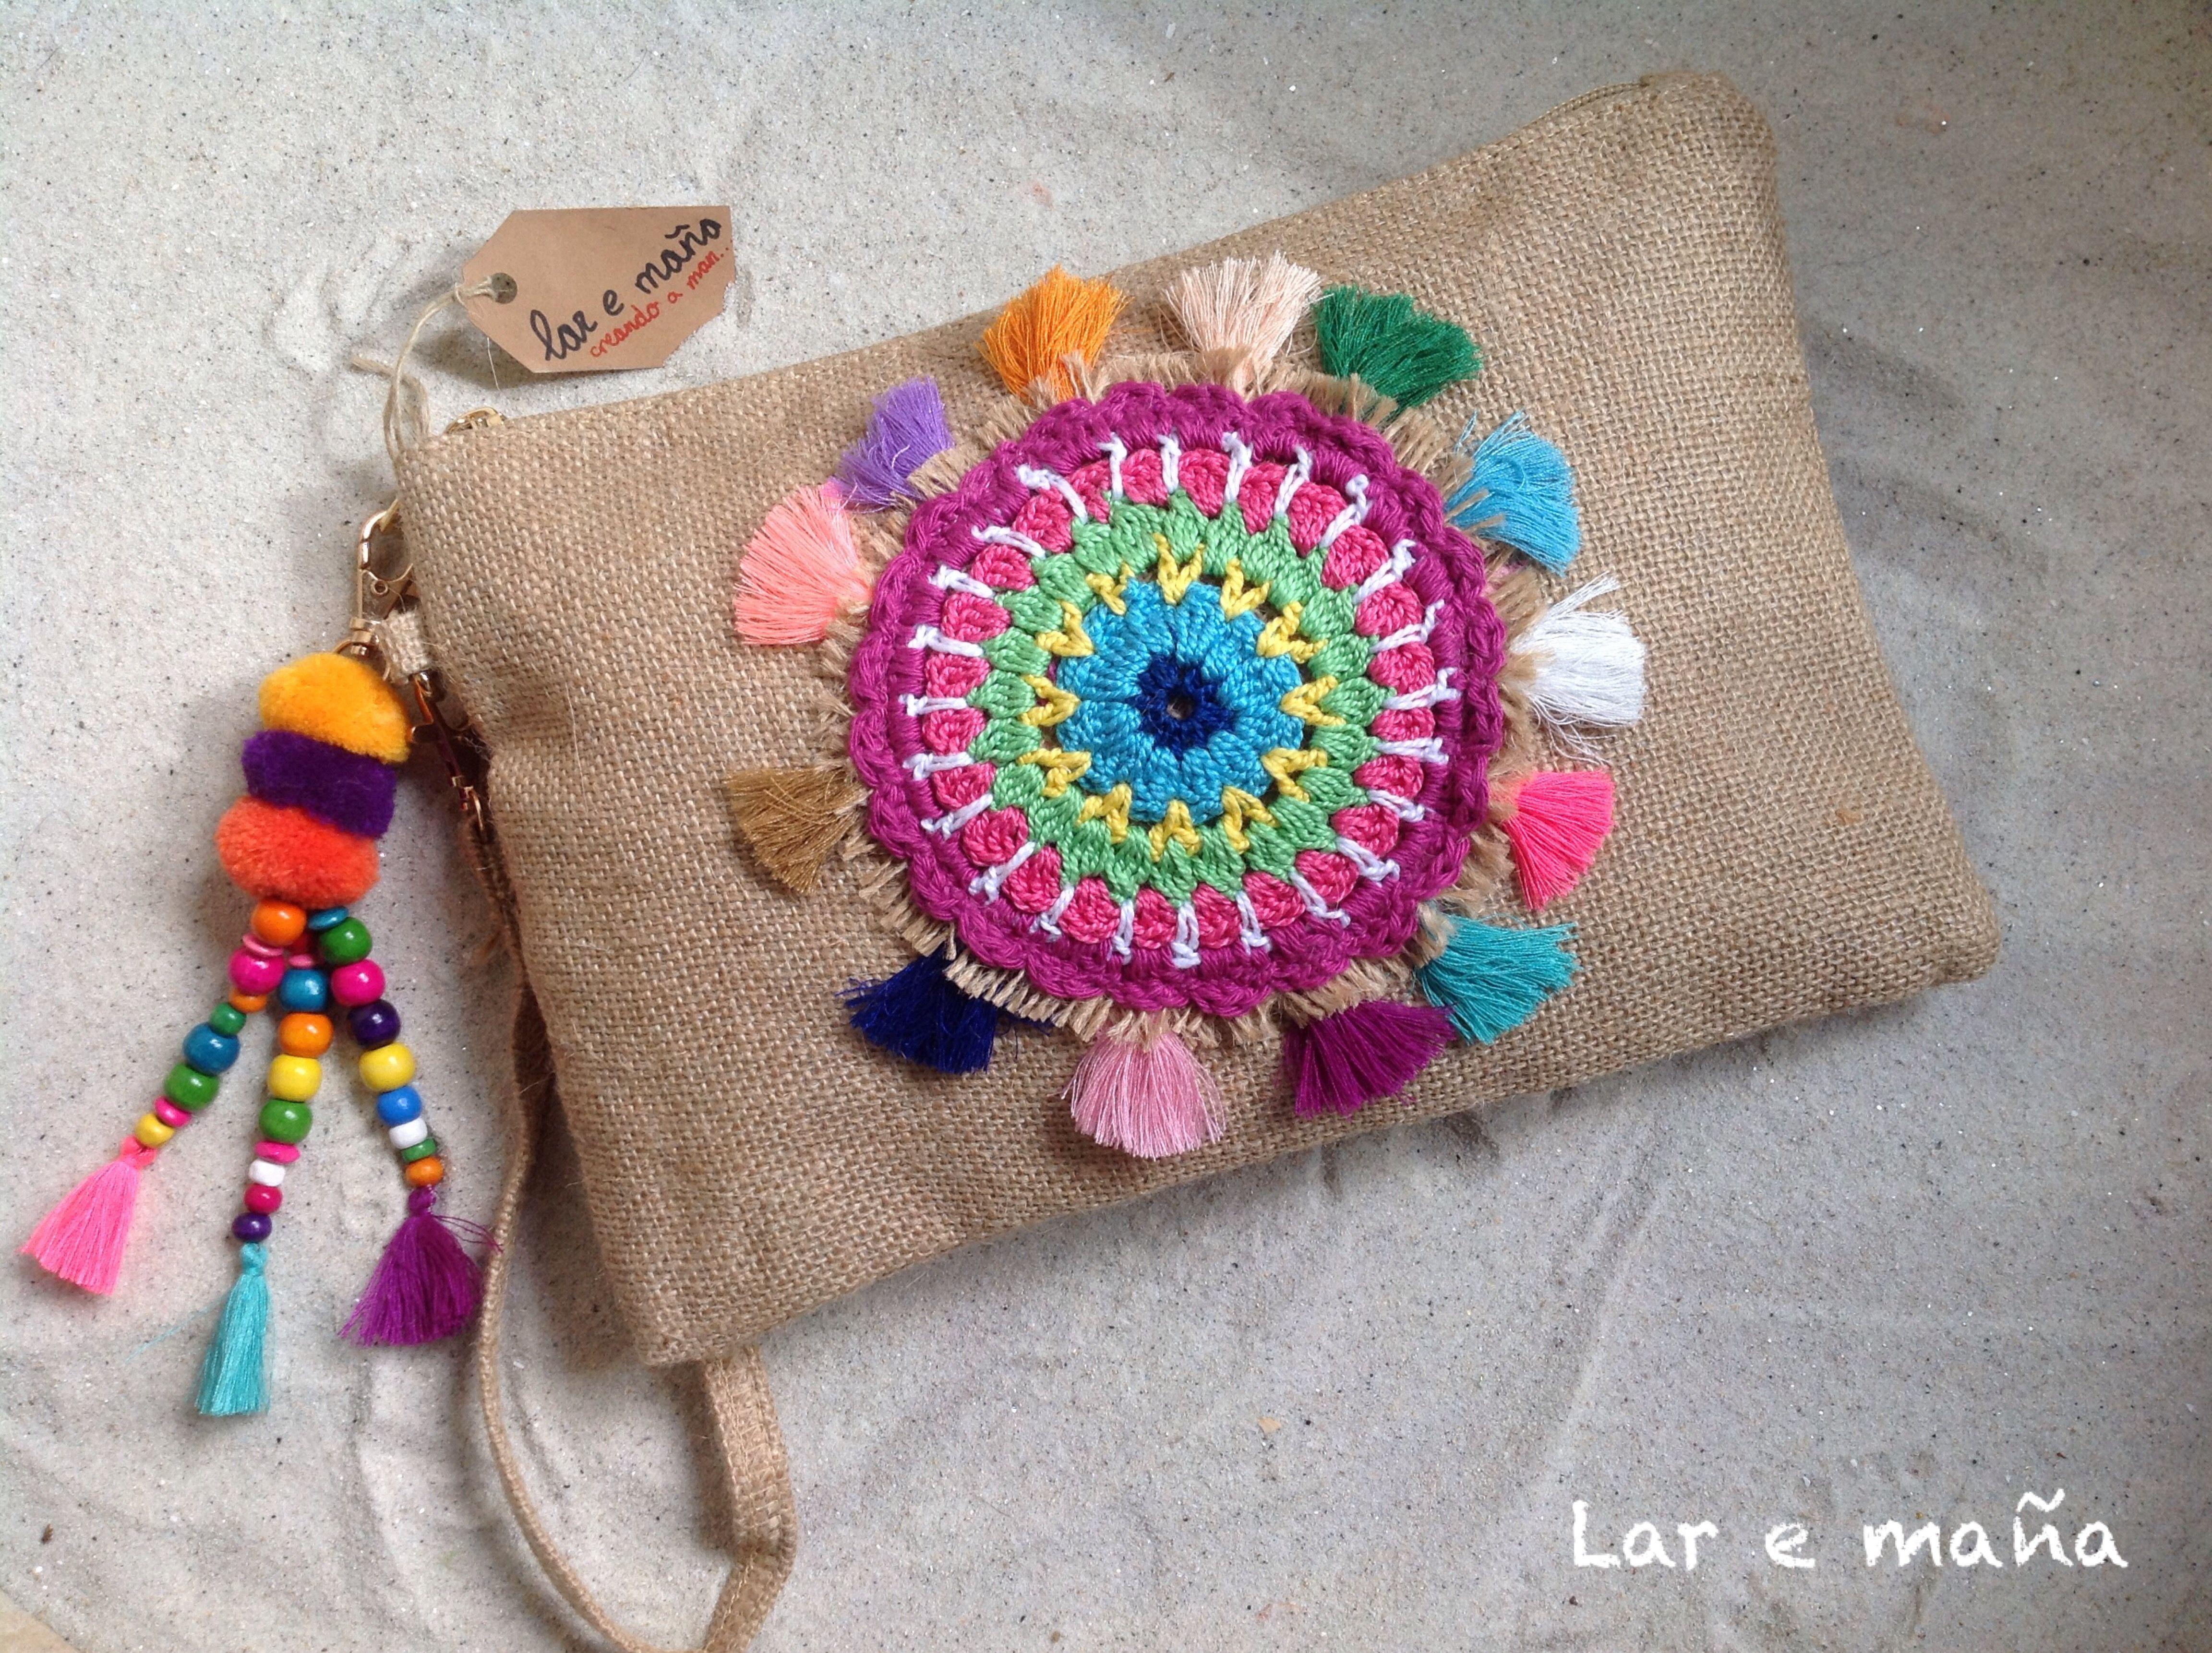 Statement Clutch - Crochet Mandala by VIDA VIDA 35cp3